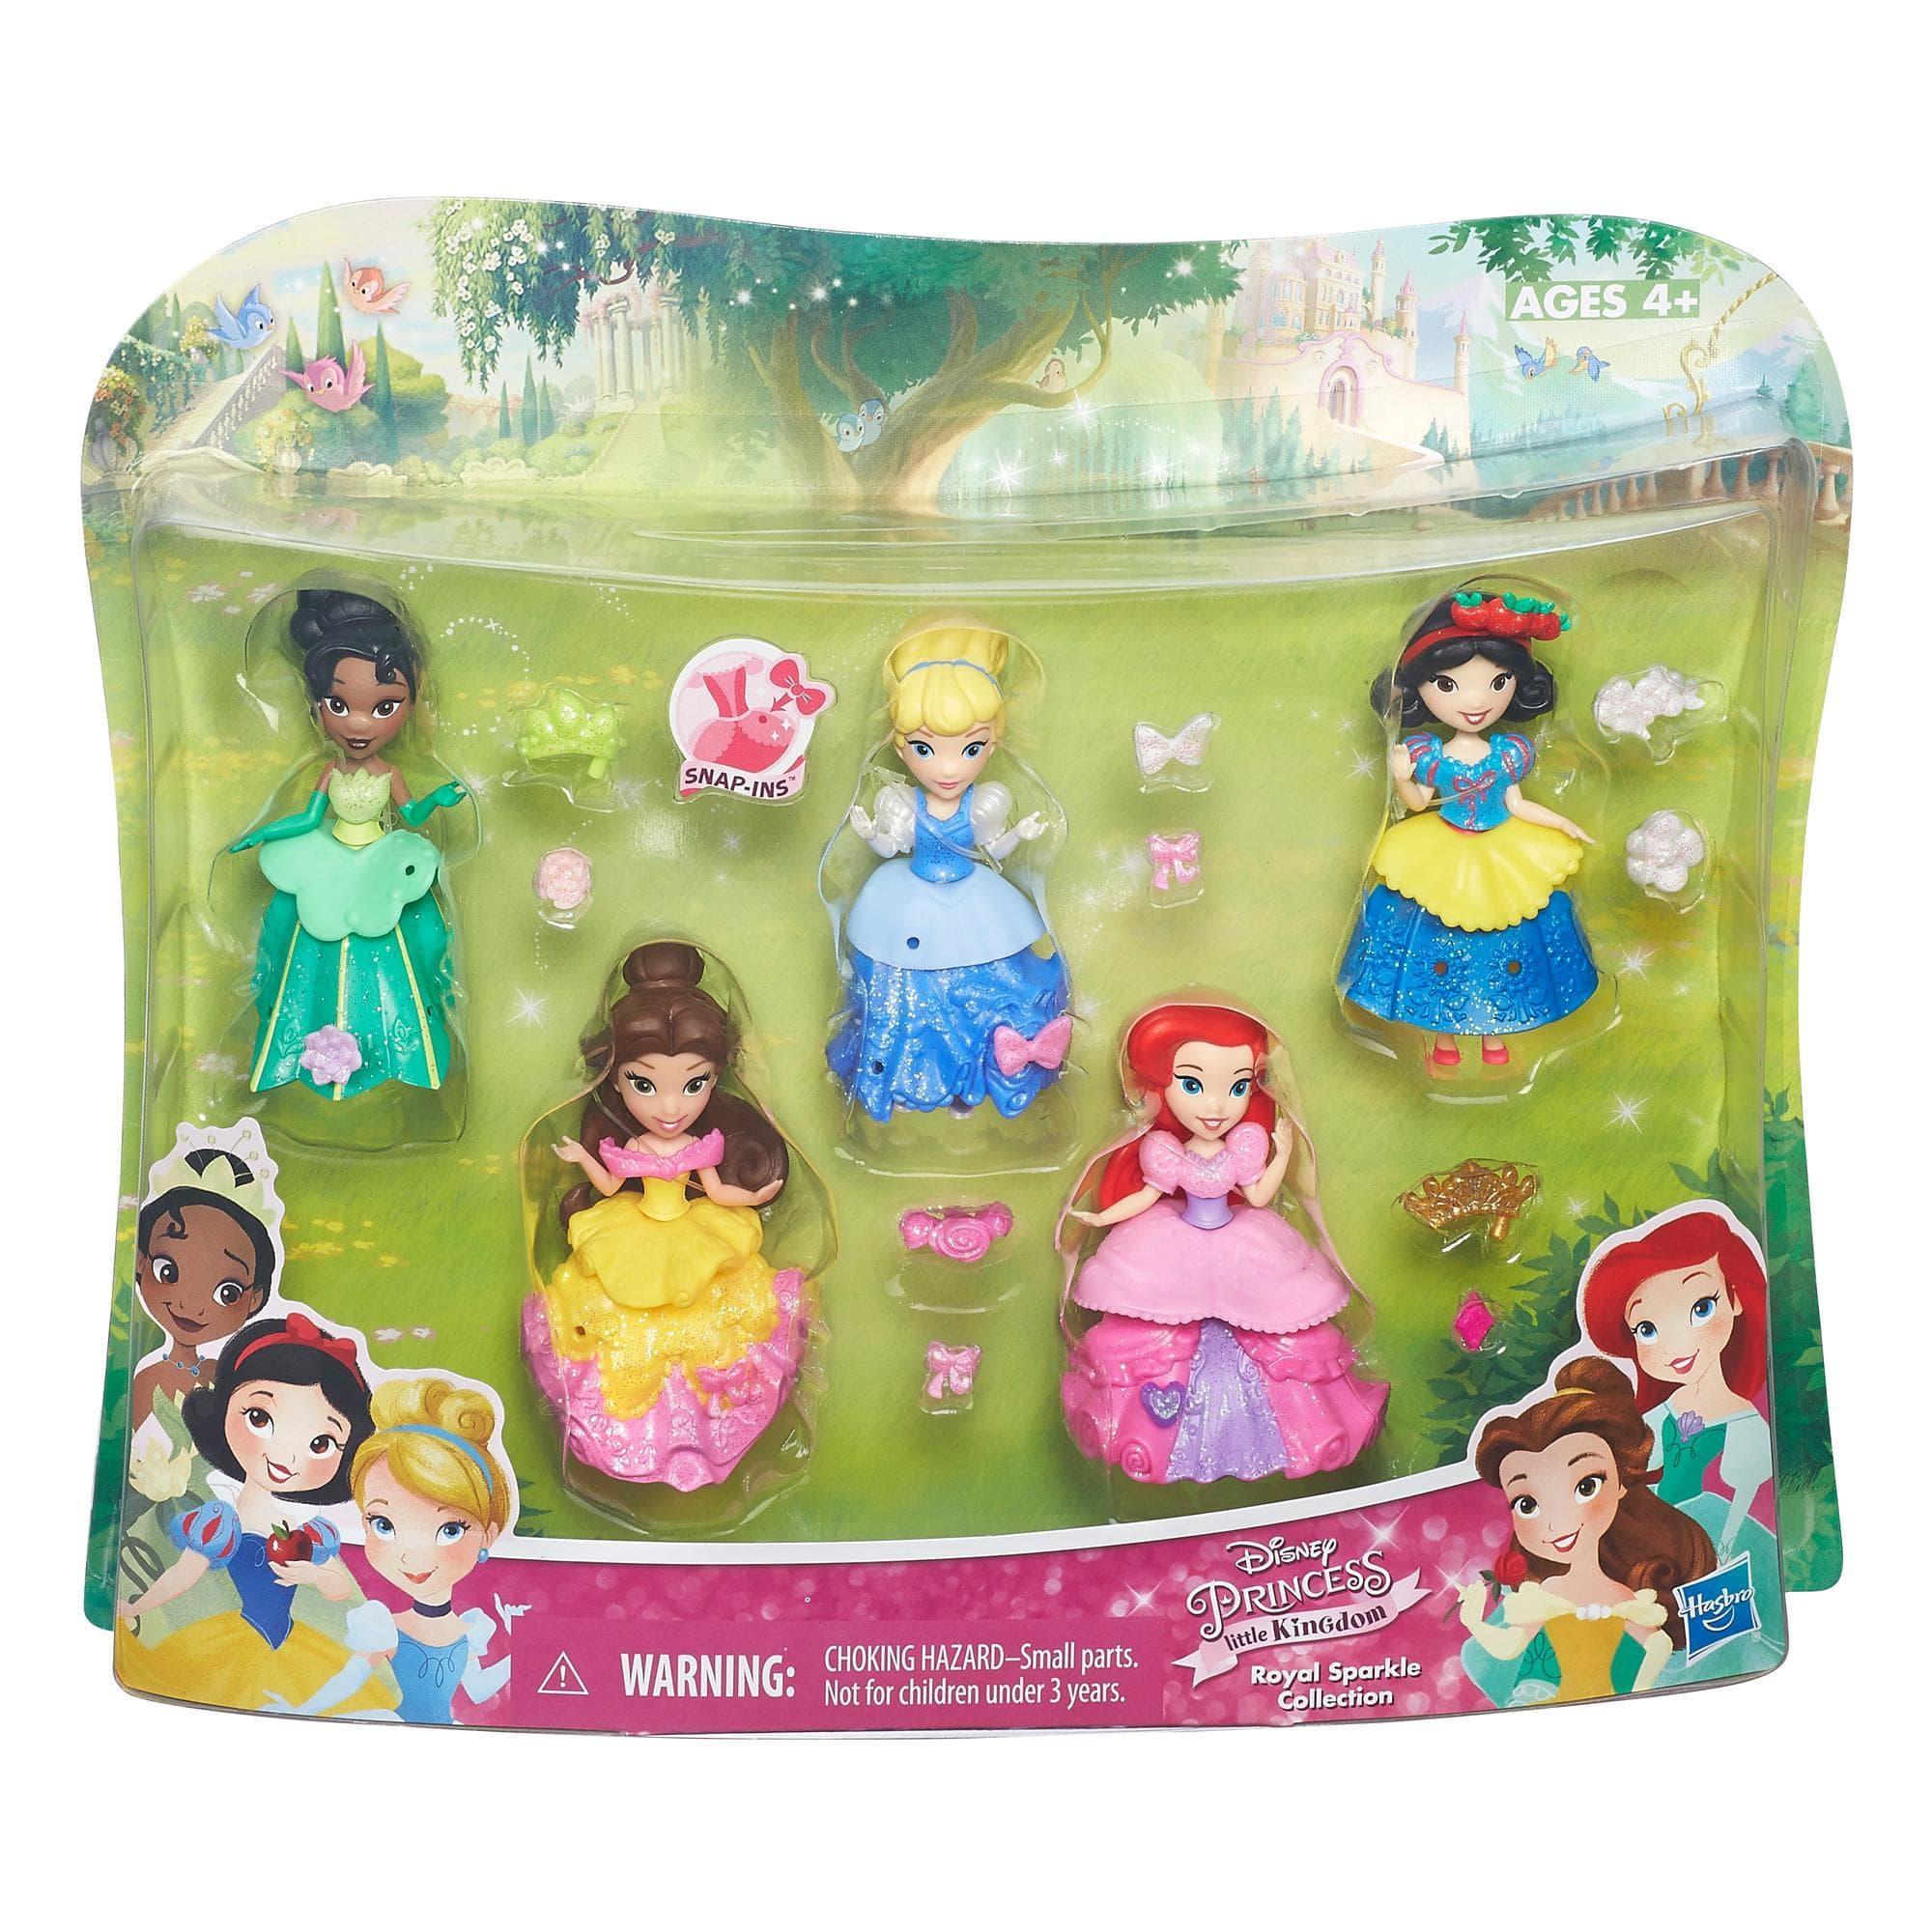 Disney Princess Little Kingdom Magiclip Sleeping Beauty: Disney Princess Little Kingdom Royal Sparkle Collection